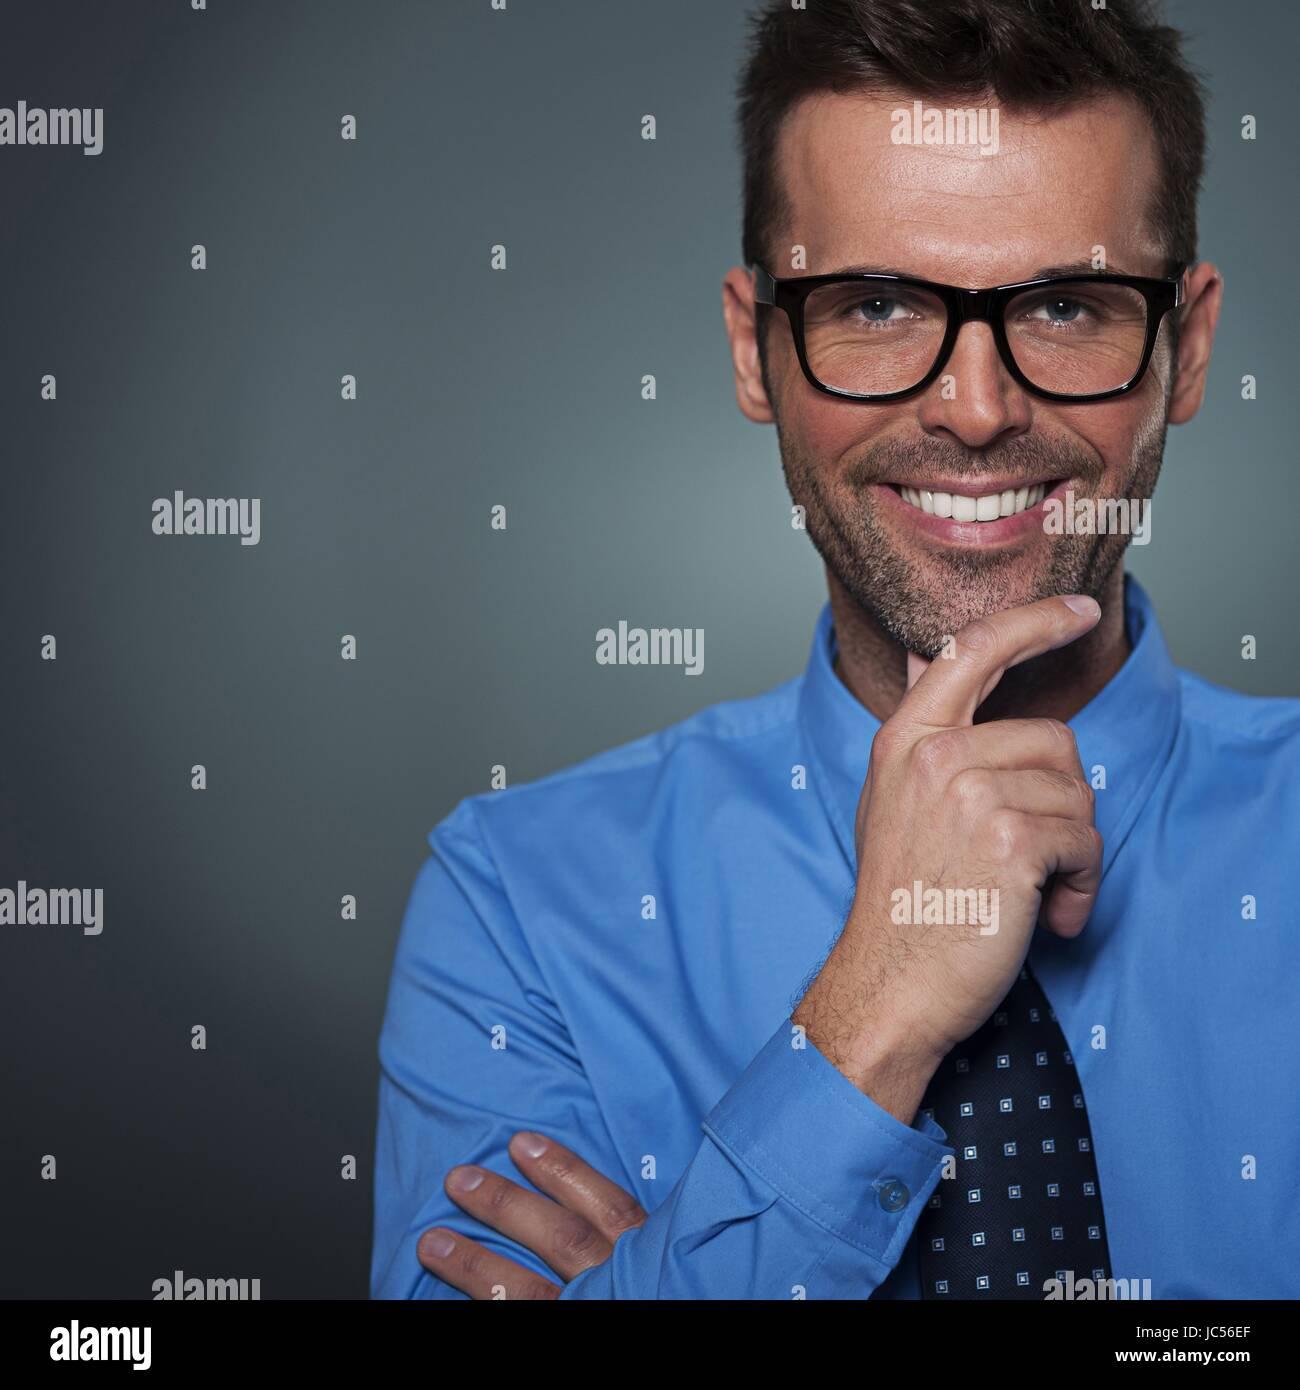 smiles career - Stock Image